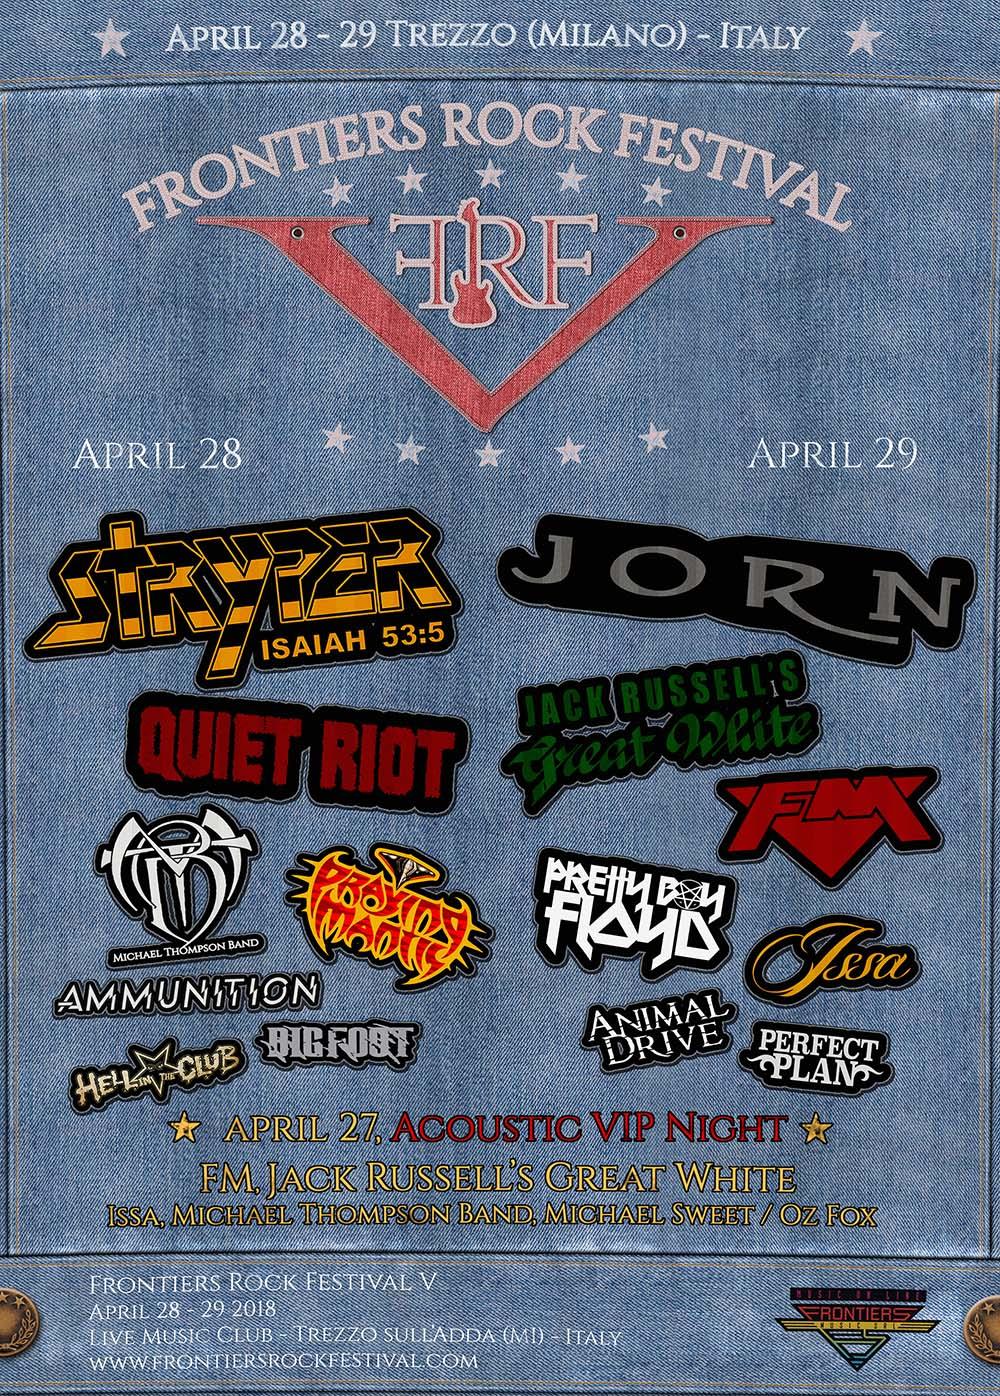 Frontiers Rock festival V